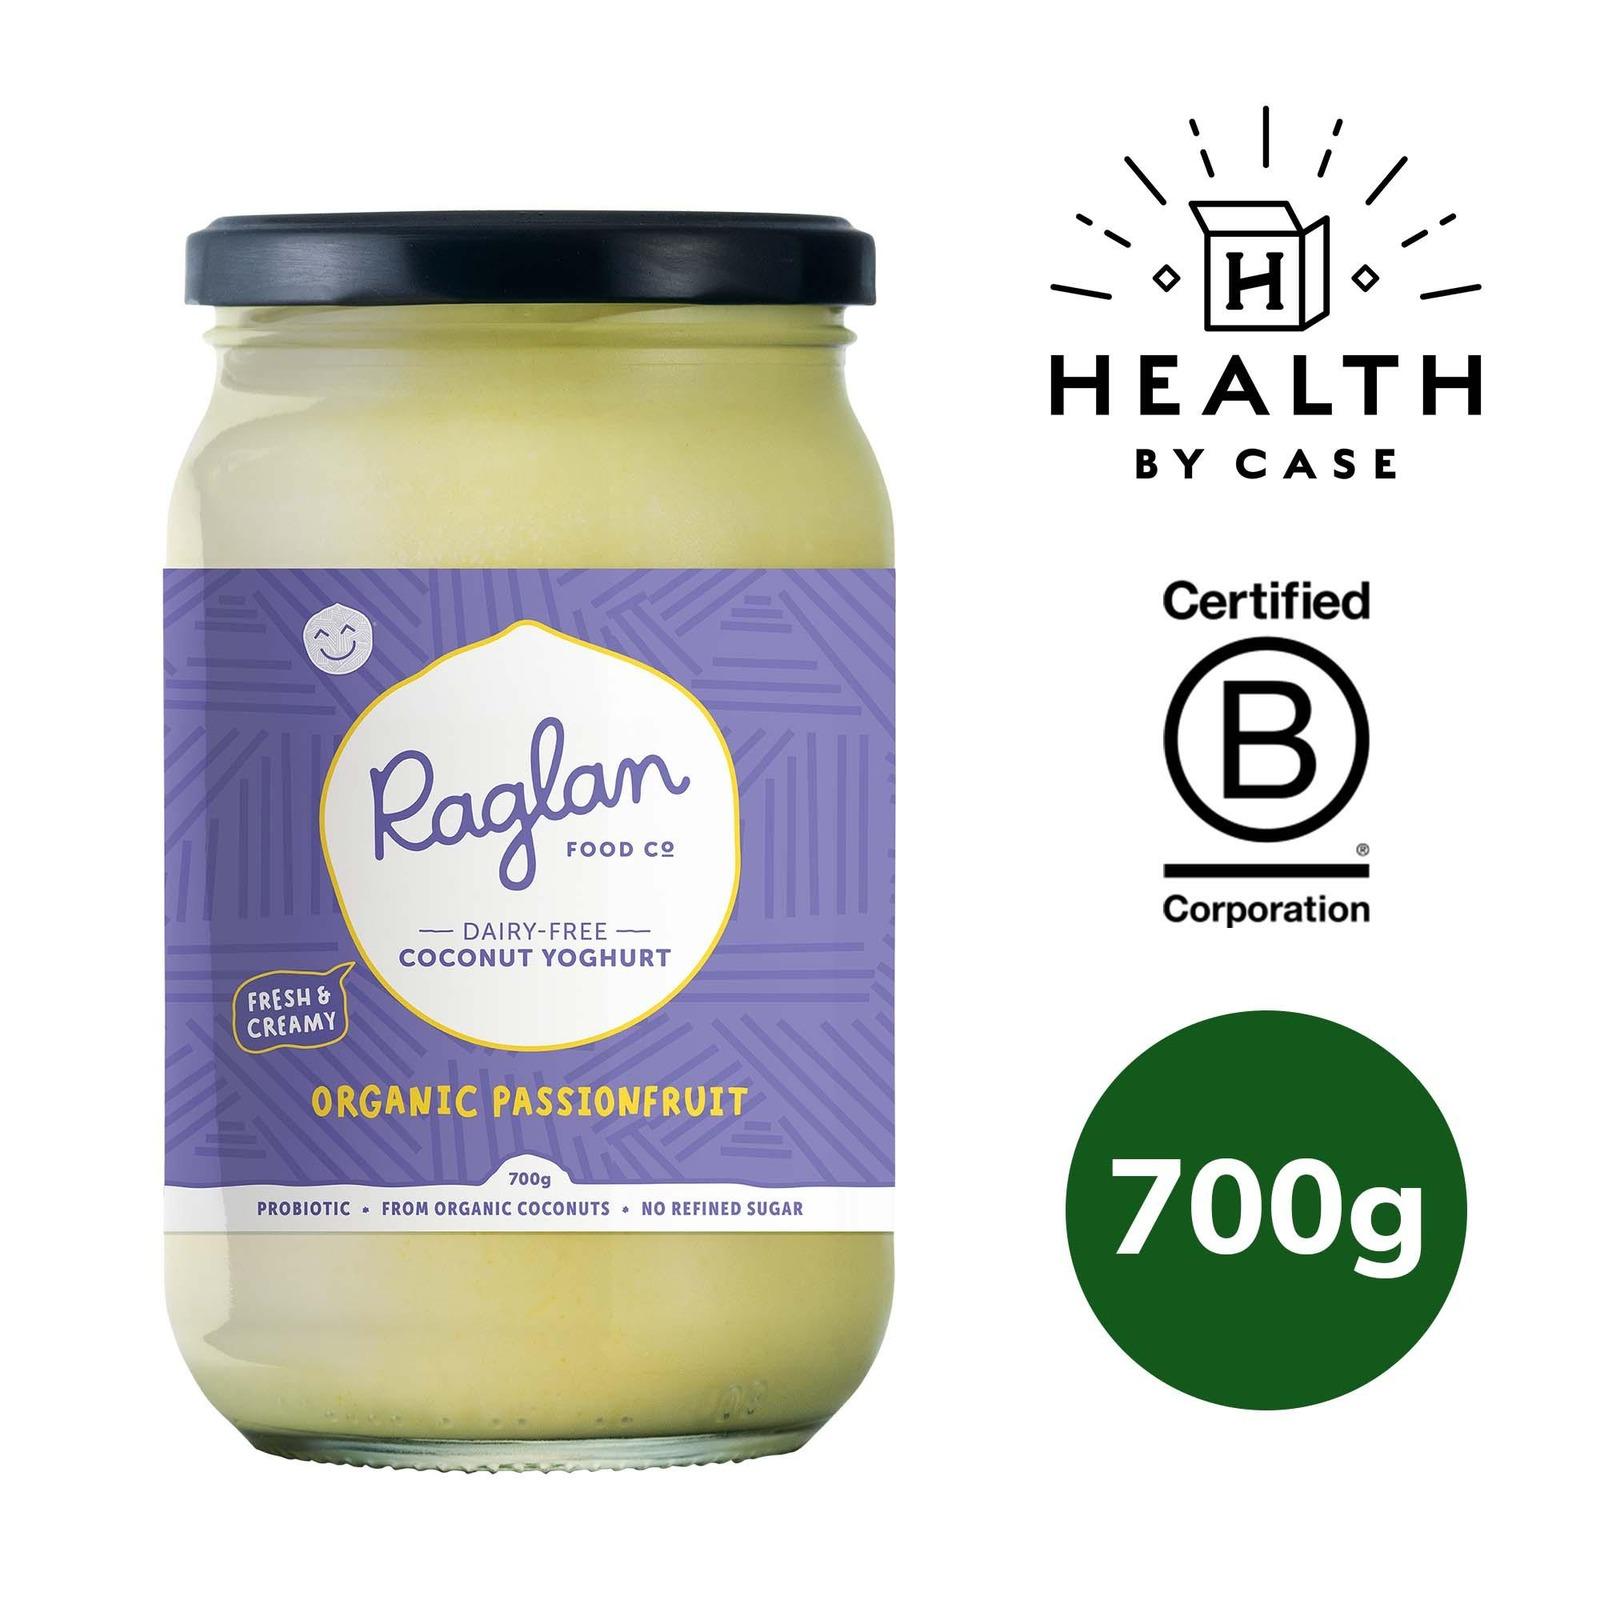 Raglan Food Company Coconut Yoghurt - Organic Passionfruit